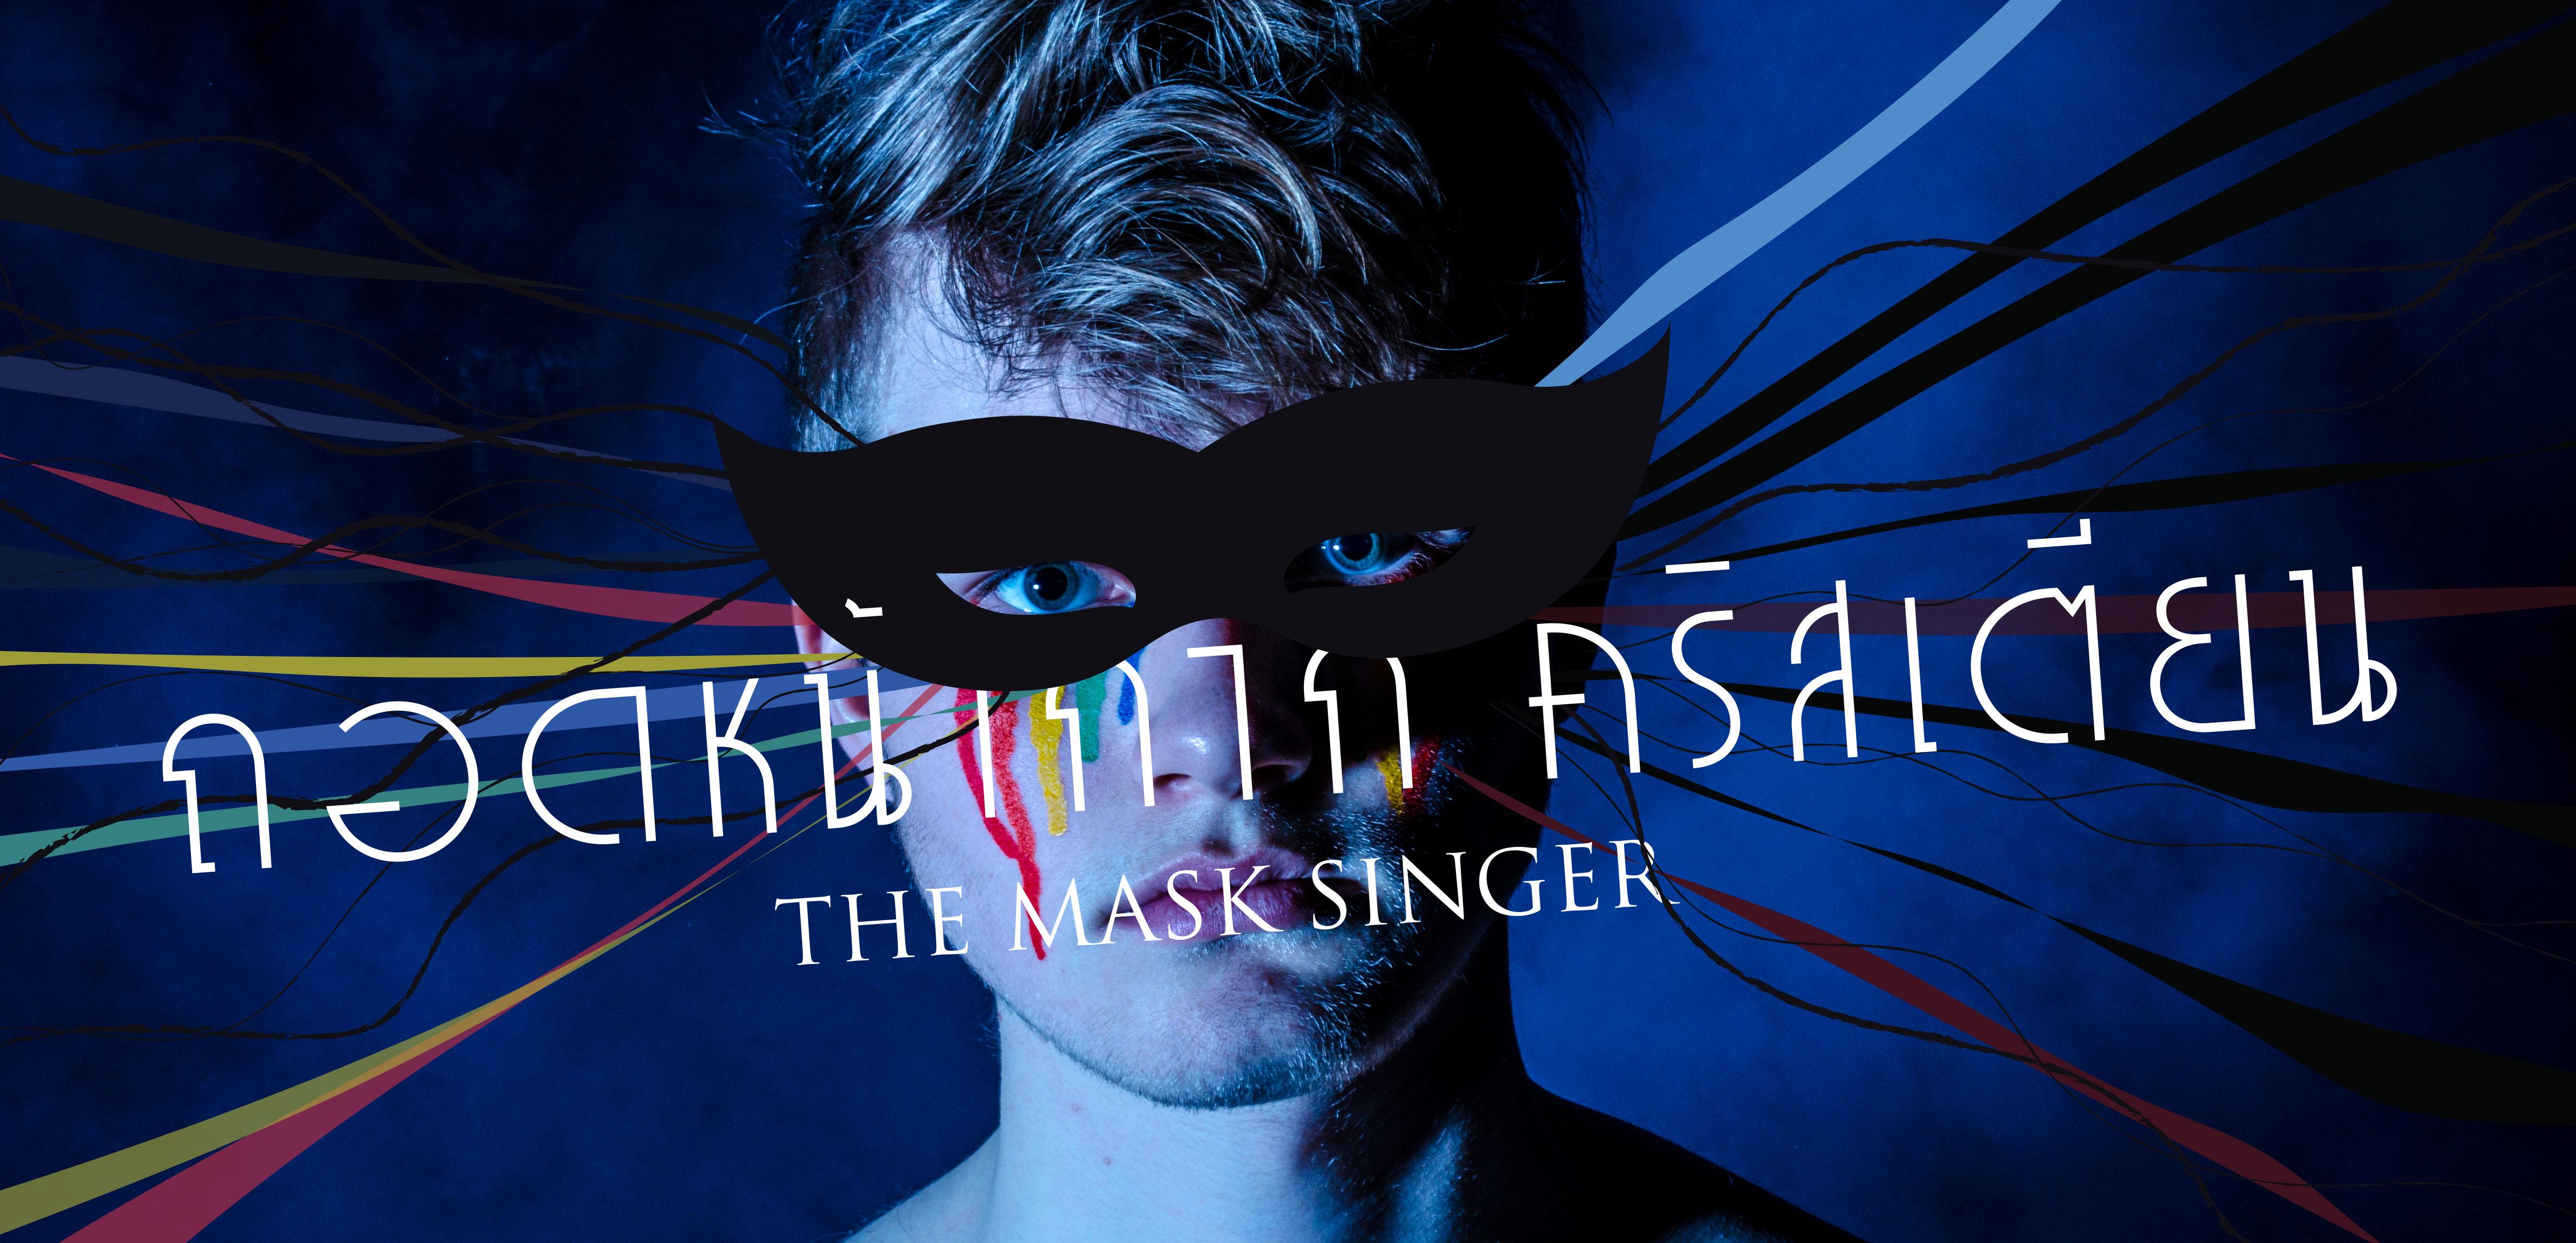 The Mask singer thailand